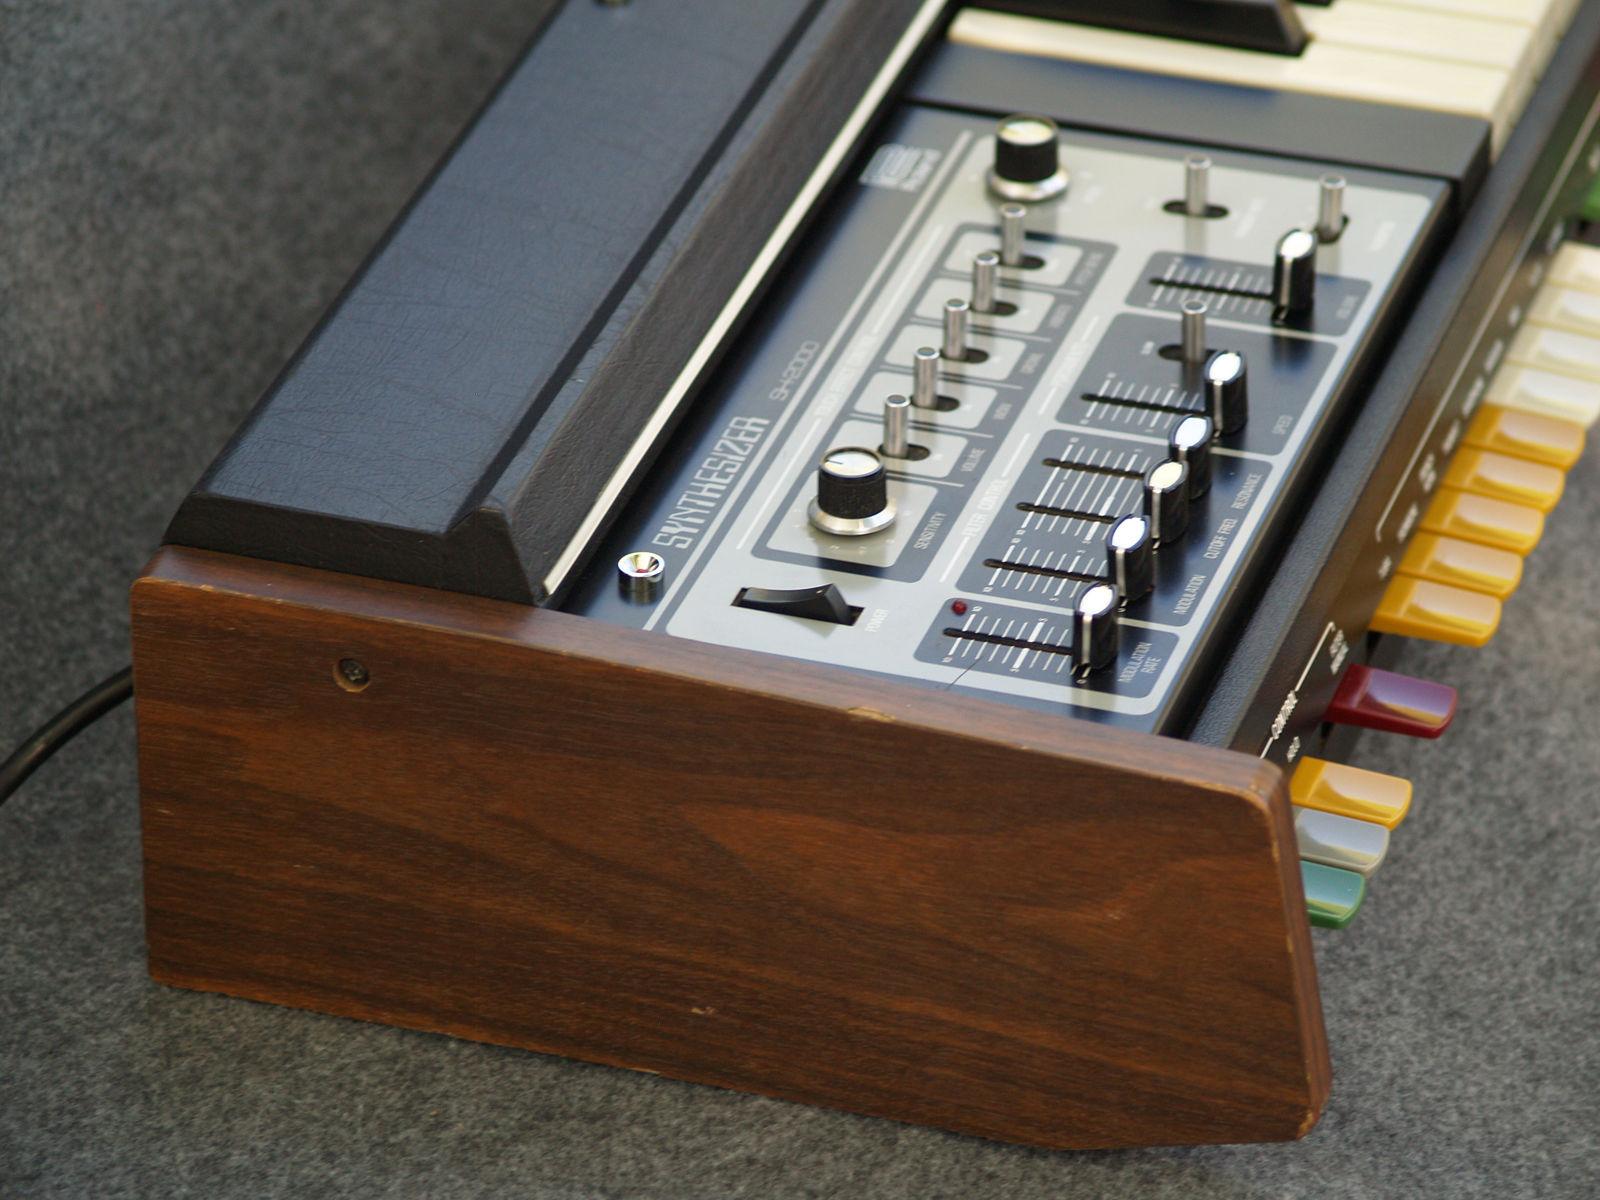 Matrixsynth Tuesday September 16 2014 Diabolical Circuit Bent Casio Sk1 Custom Modular Roland Sh2000 Vintage 70s Analog Synthesizer